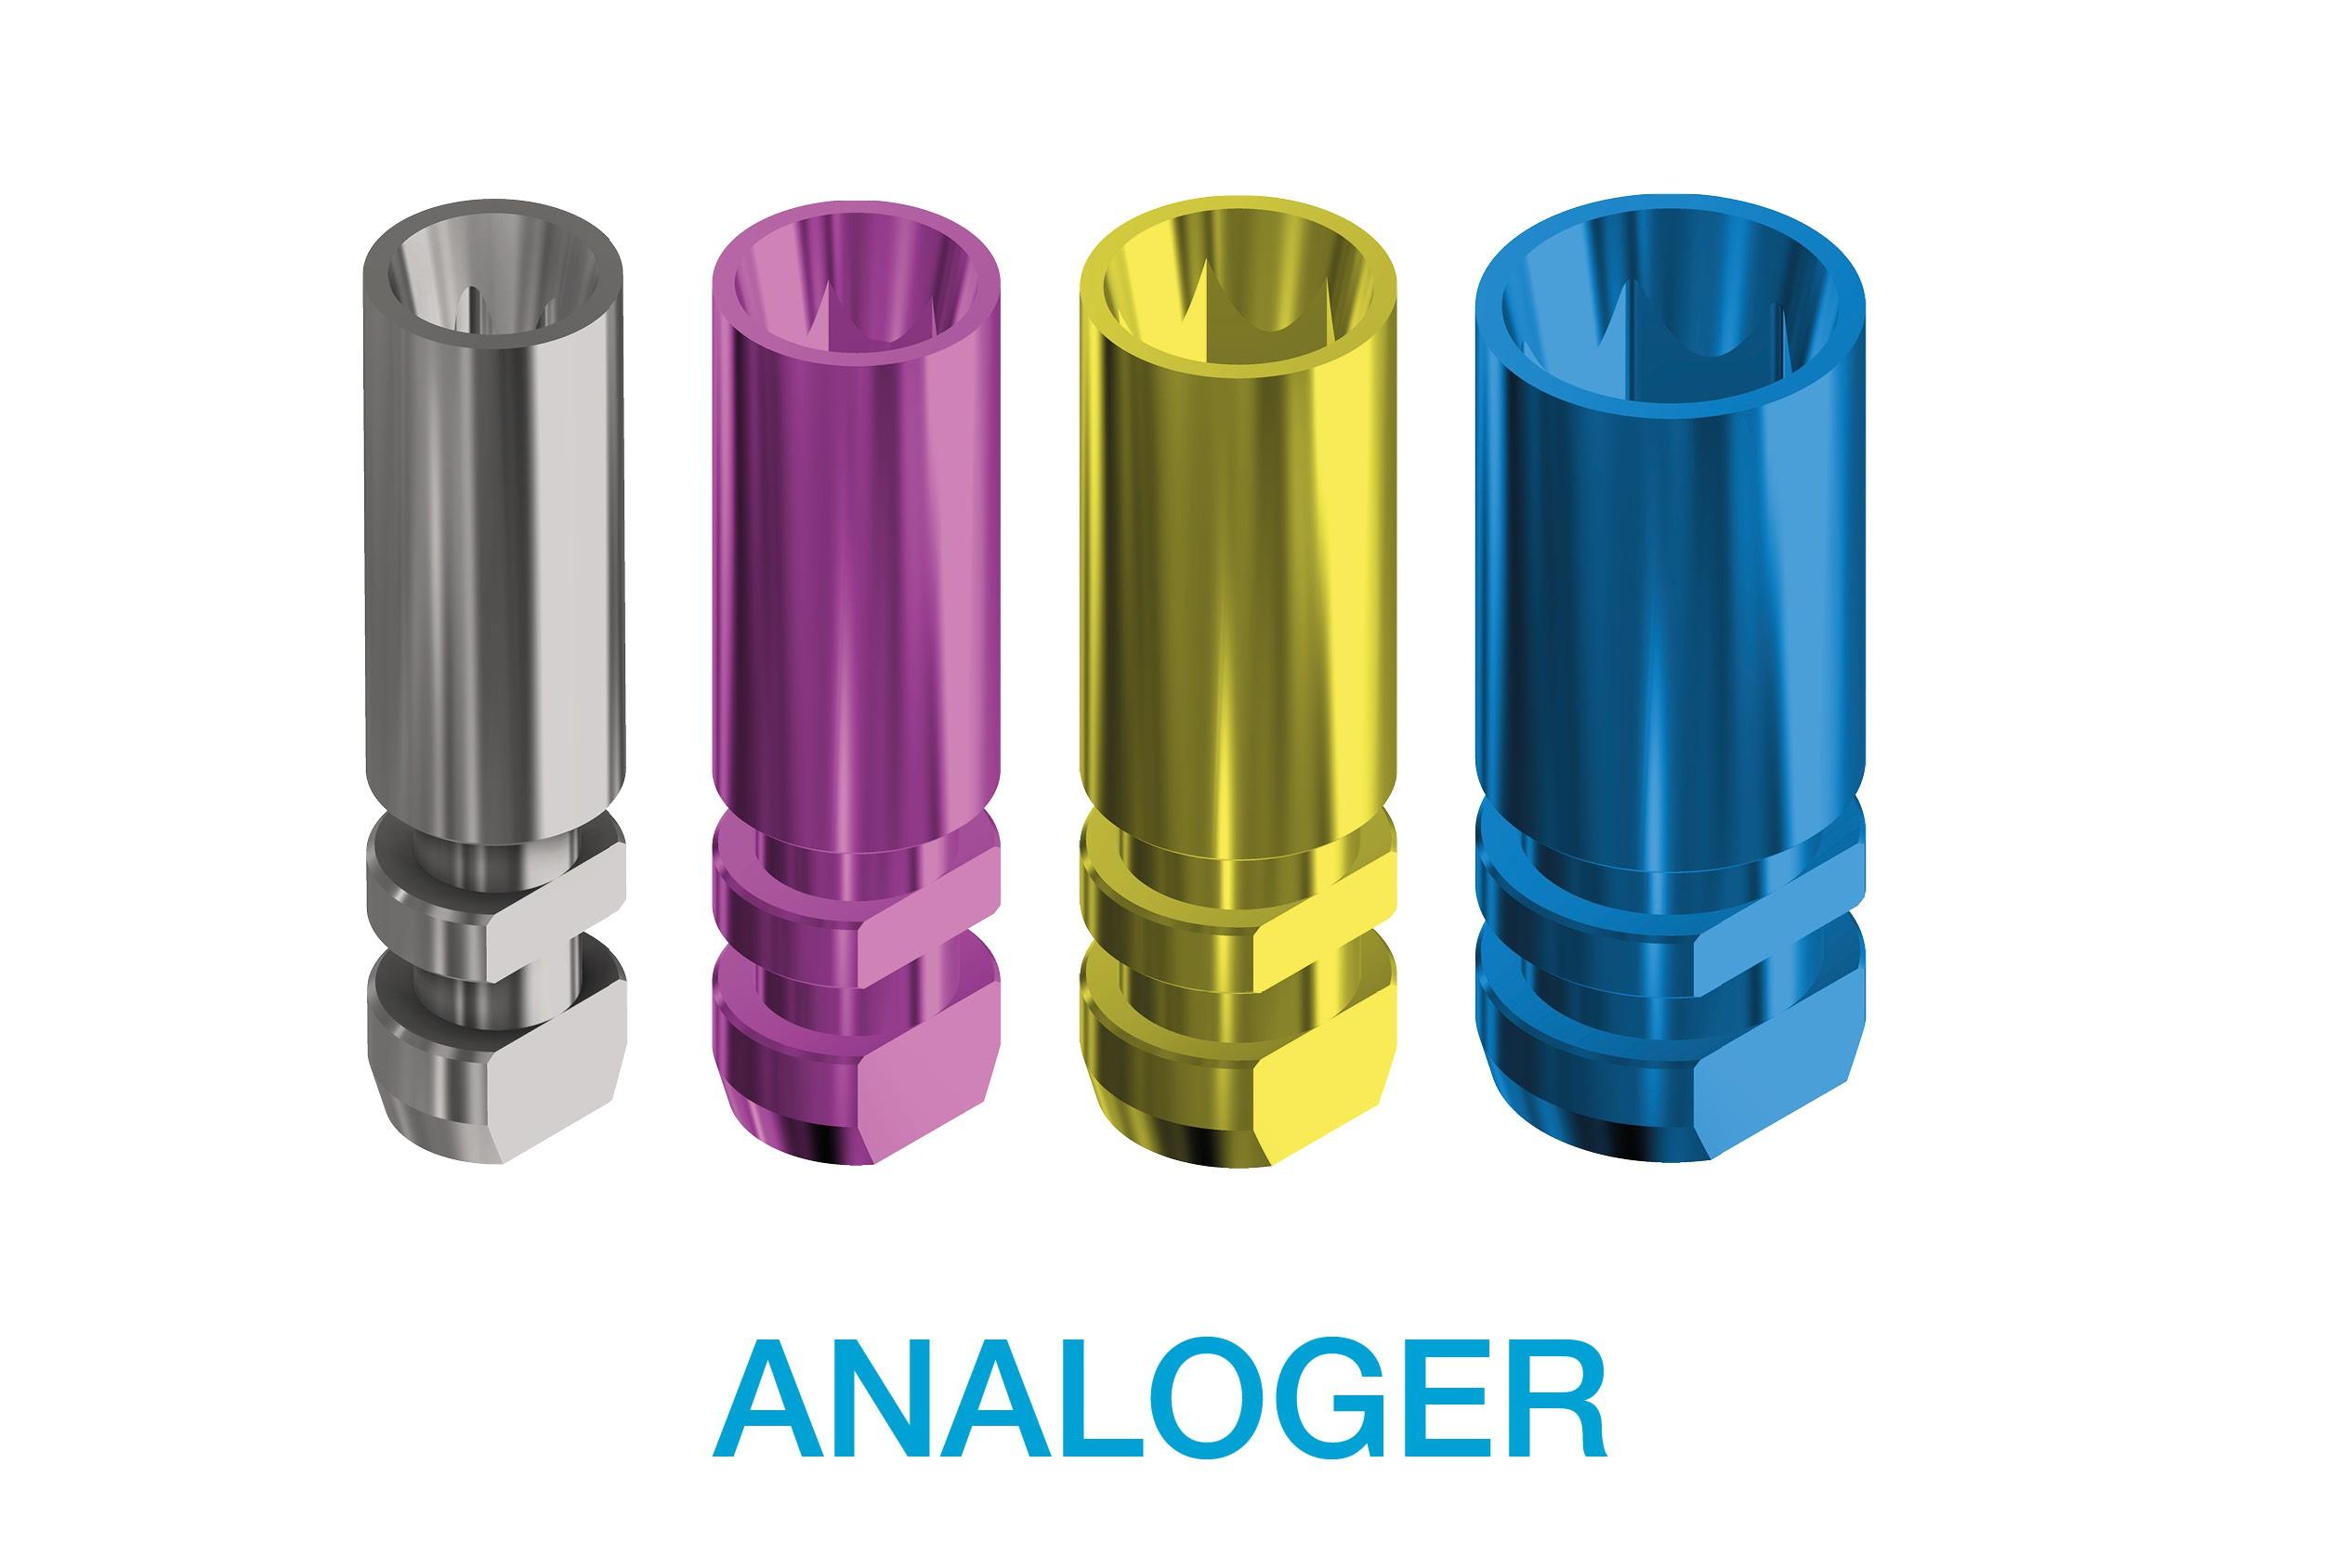 Analoger